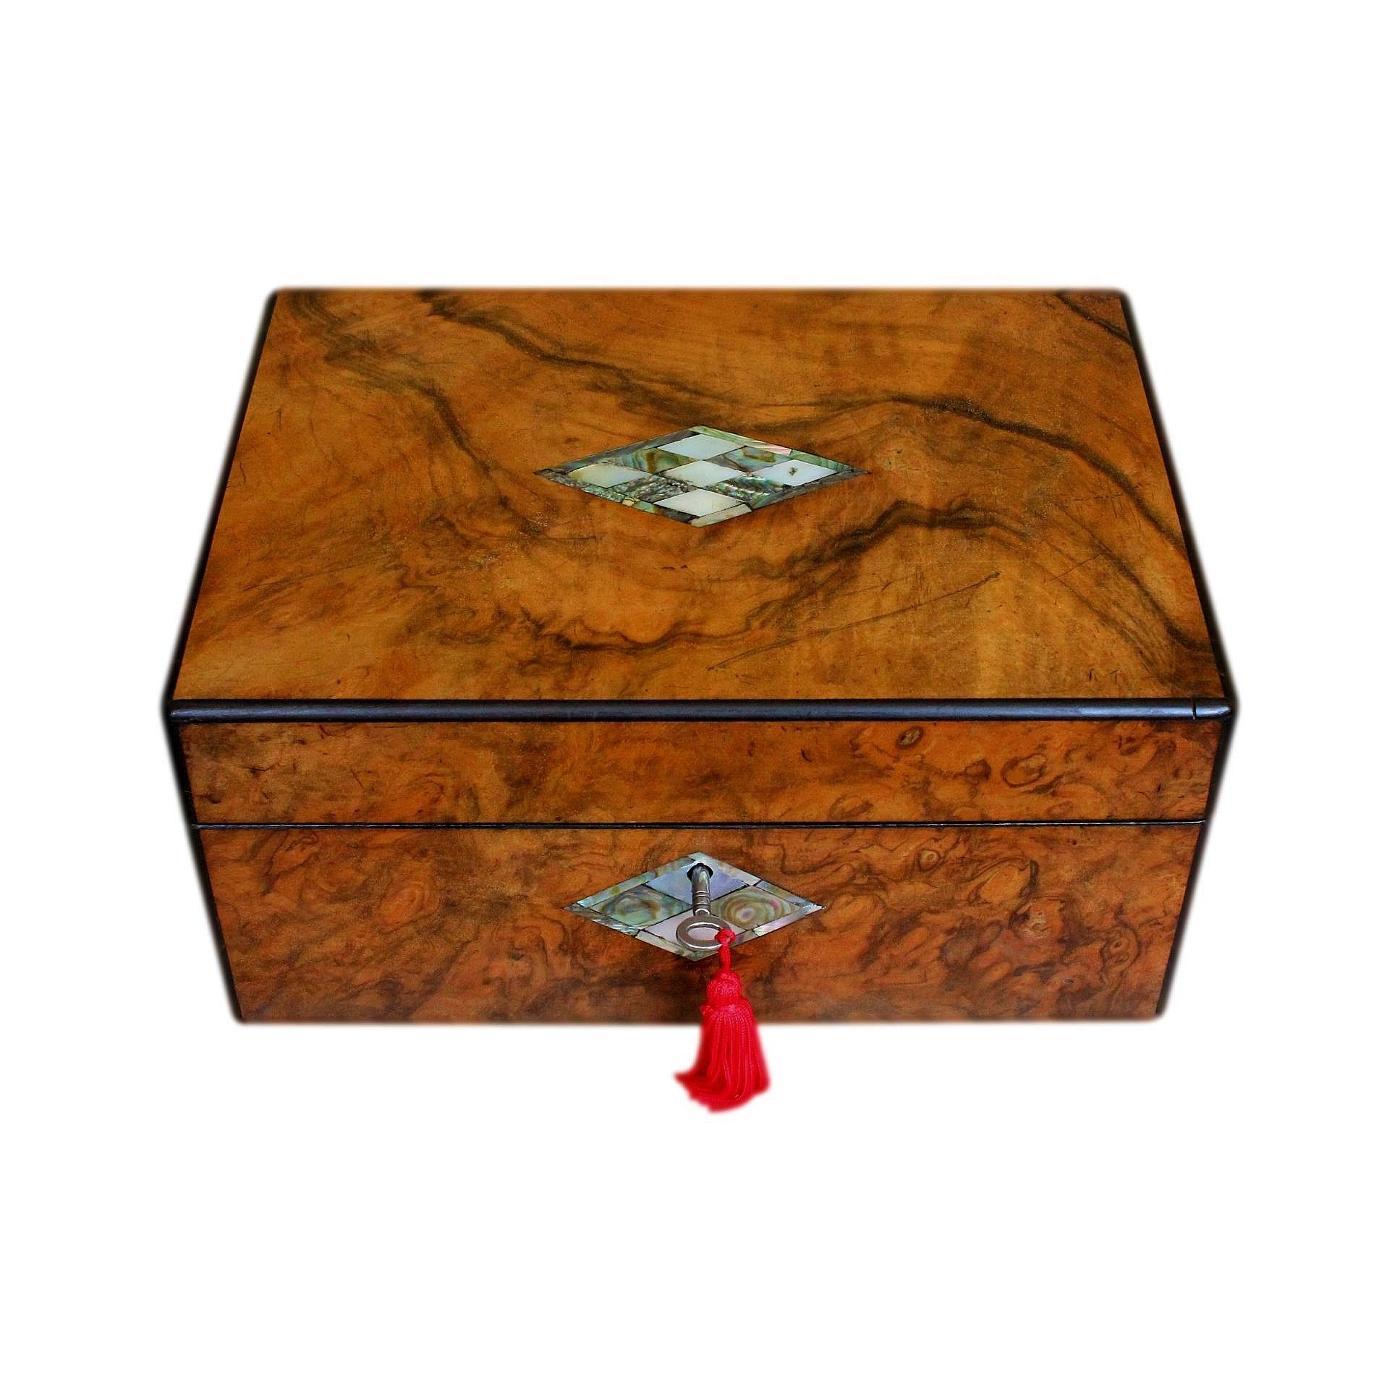 Beautifully Refurbished Antique Walnut Jewellery Box